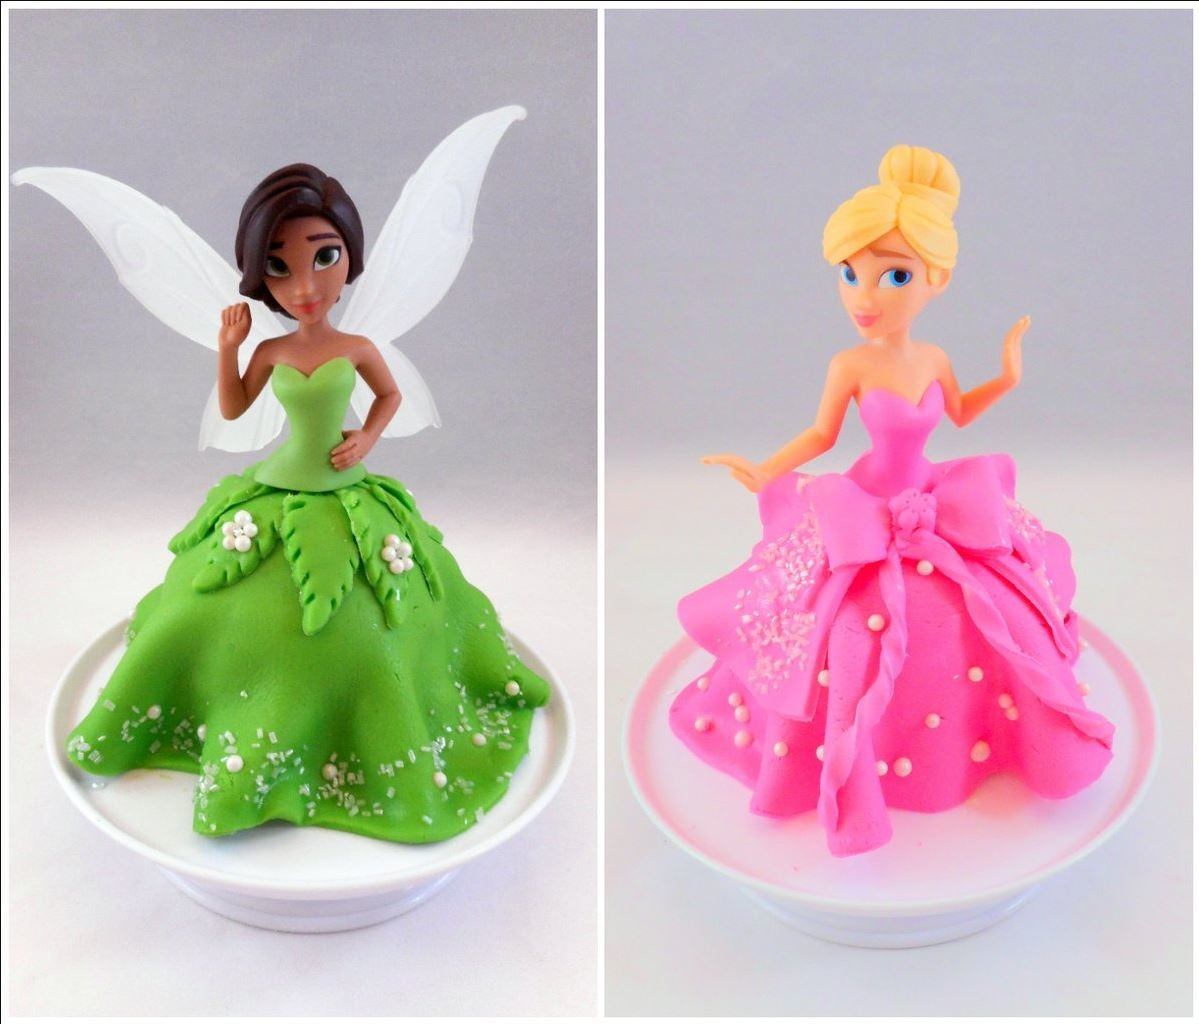 B allen princess cakes19 ballen 2017